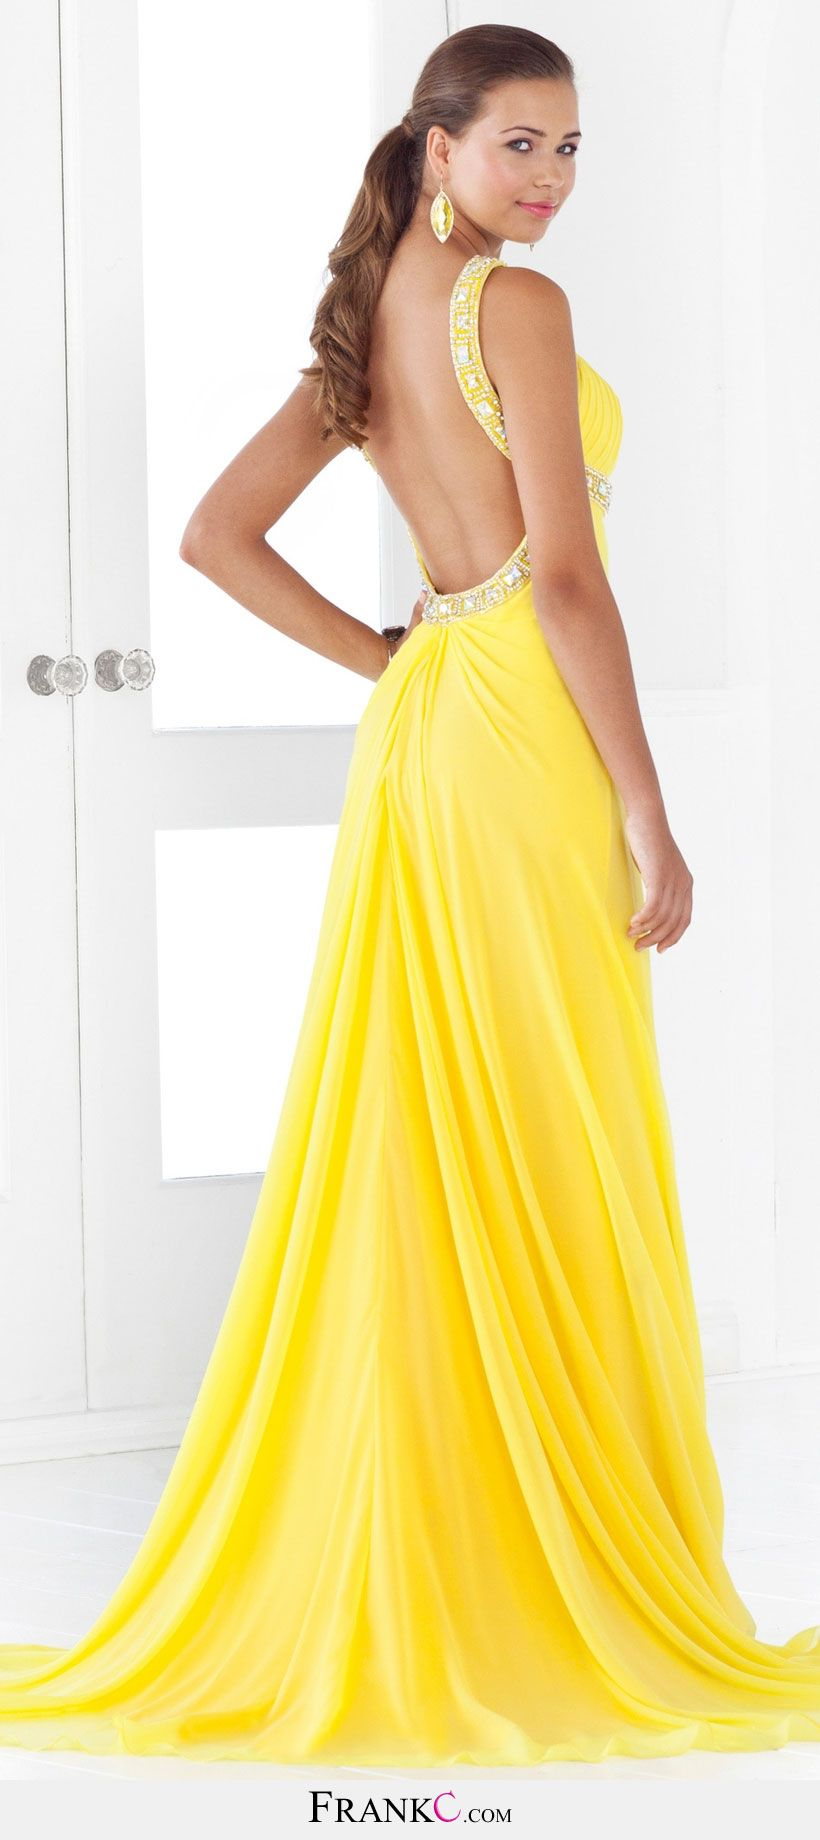 sexy prom dressyellow prom dress PROM DRESSES Pinterest